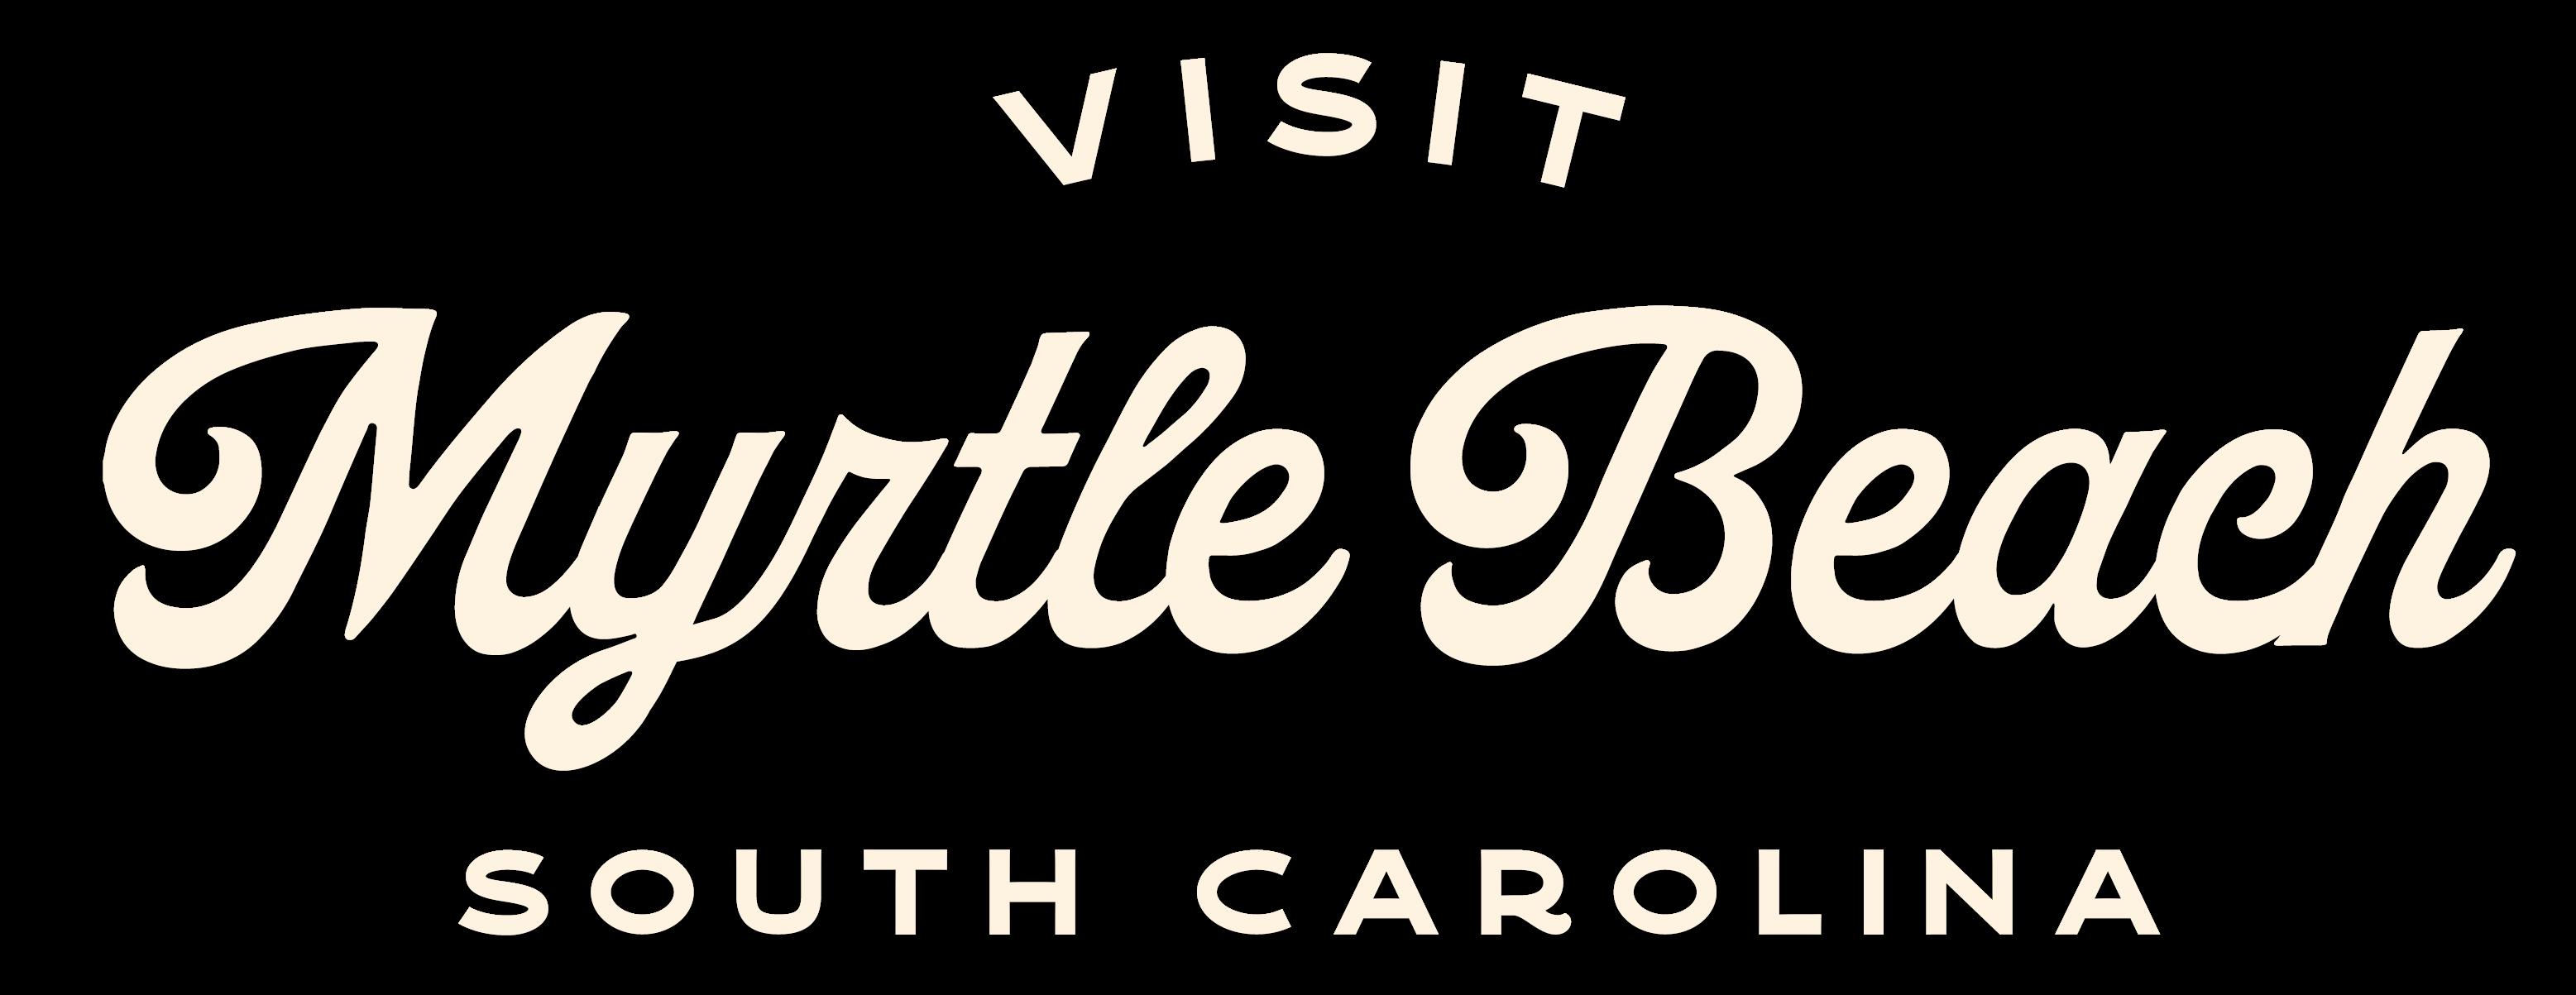 Visit Myrtle Beach South Carolina Logo